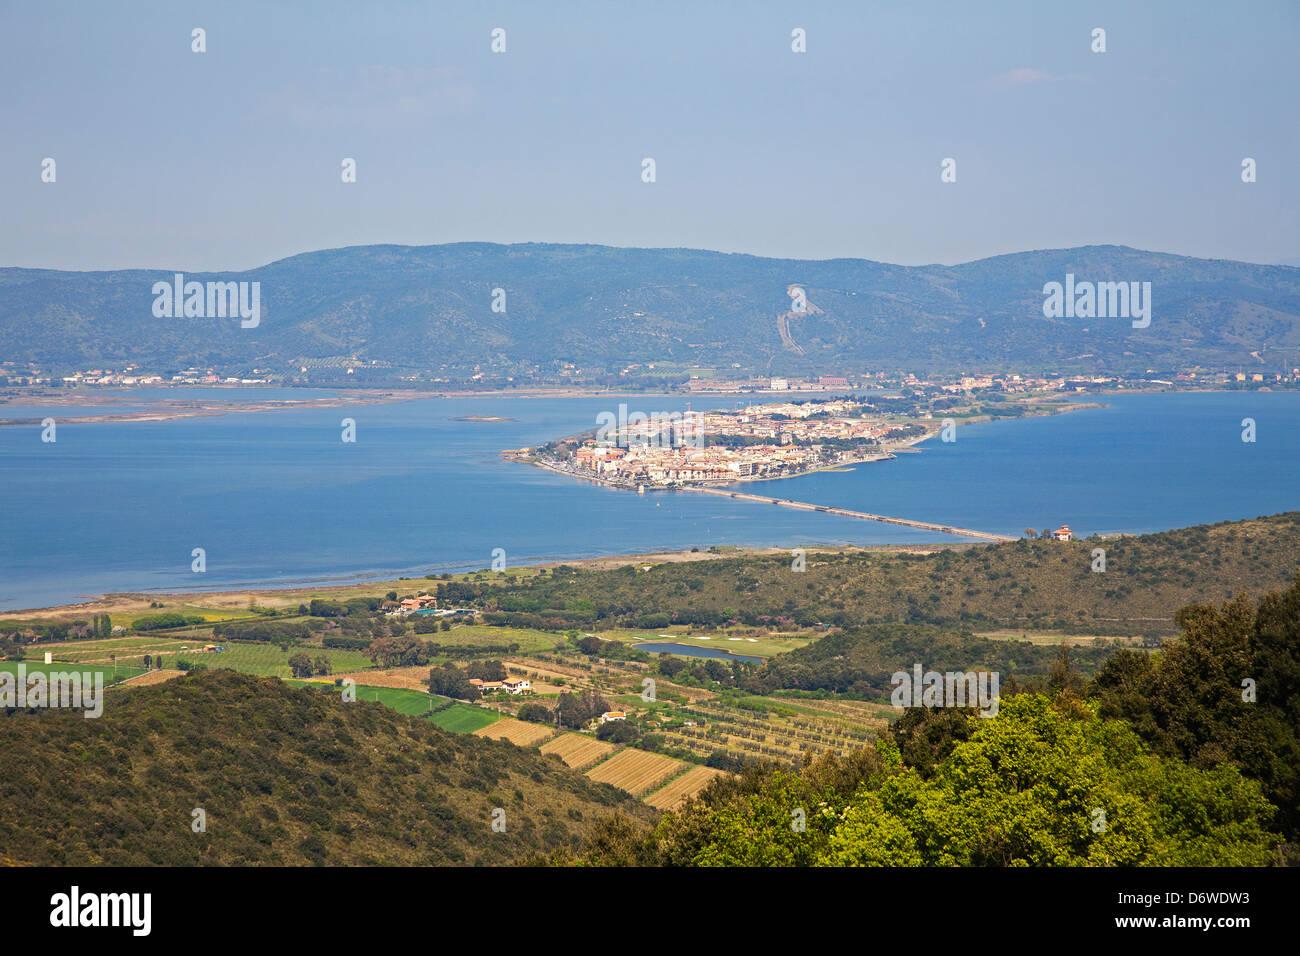 lagoon of orbetello, argentario, maremma, tuscany, italy, europe - Stock Image